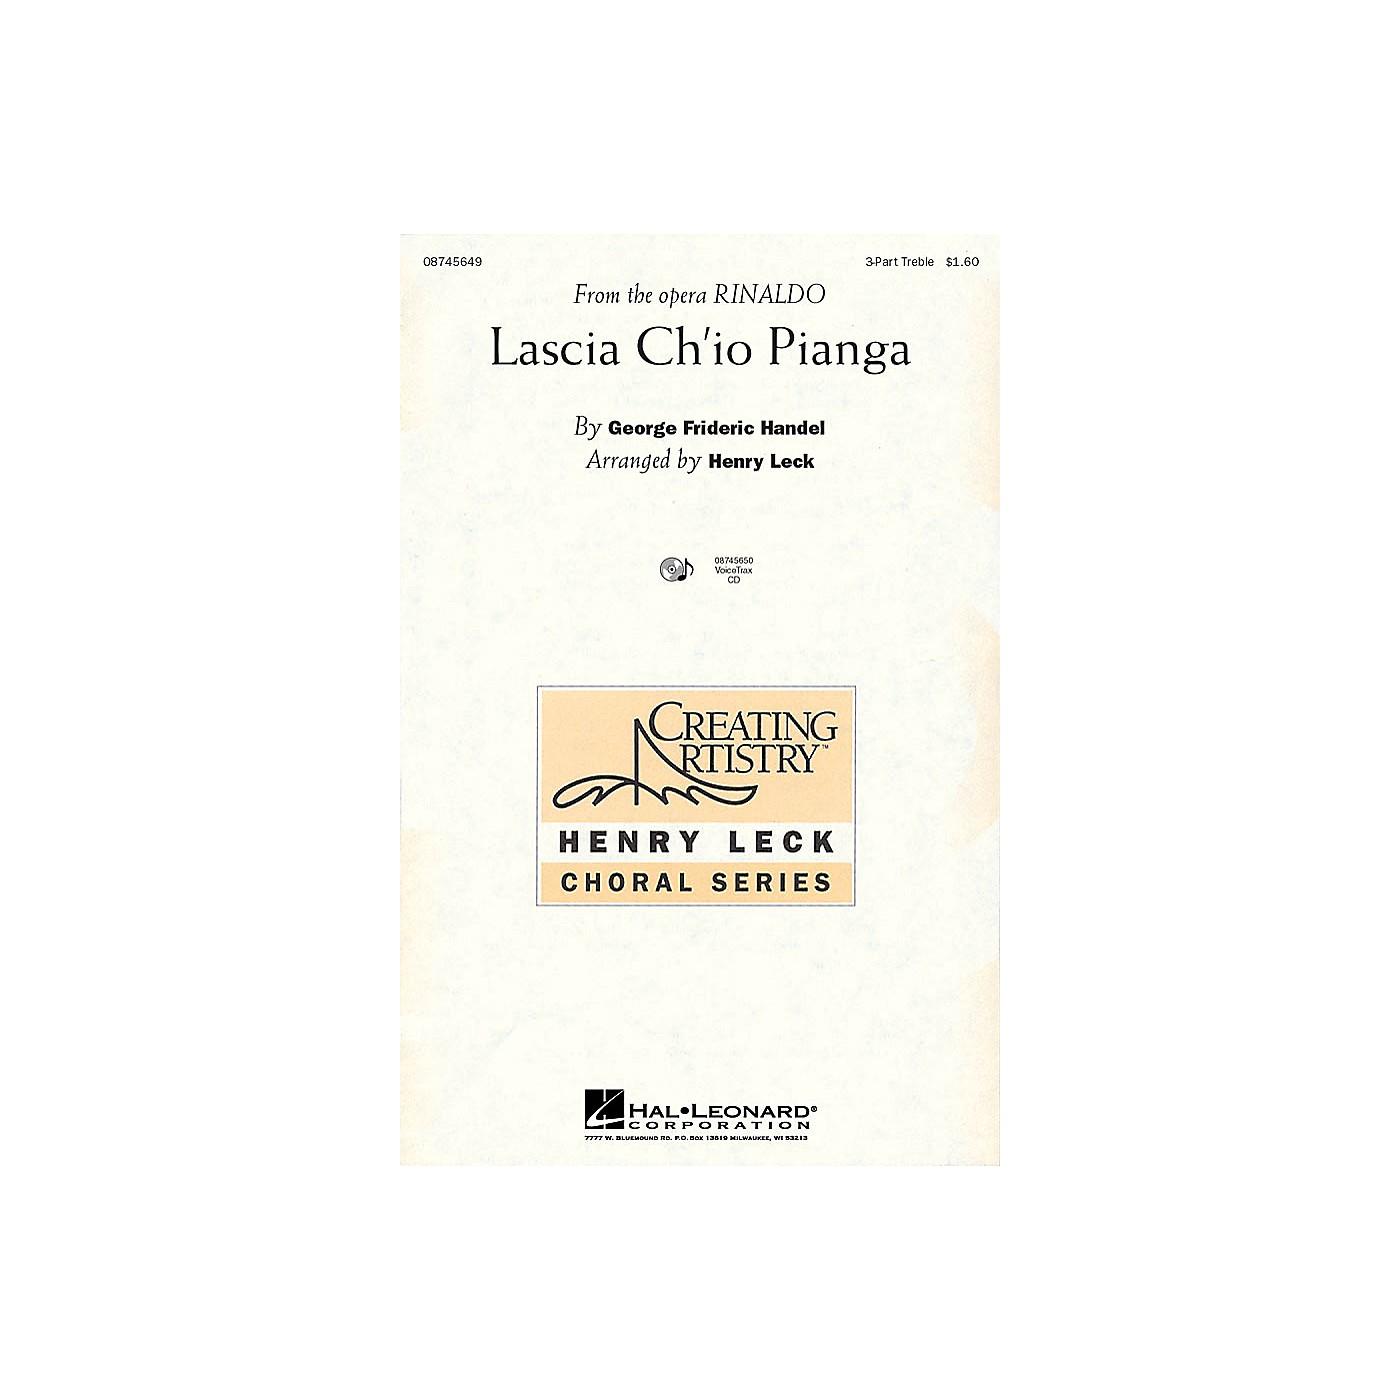 Hal Leonard Lascia Ch'io Pianga (from the opera Rinaldo) 3 Part Treble thumbnail